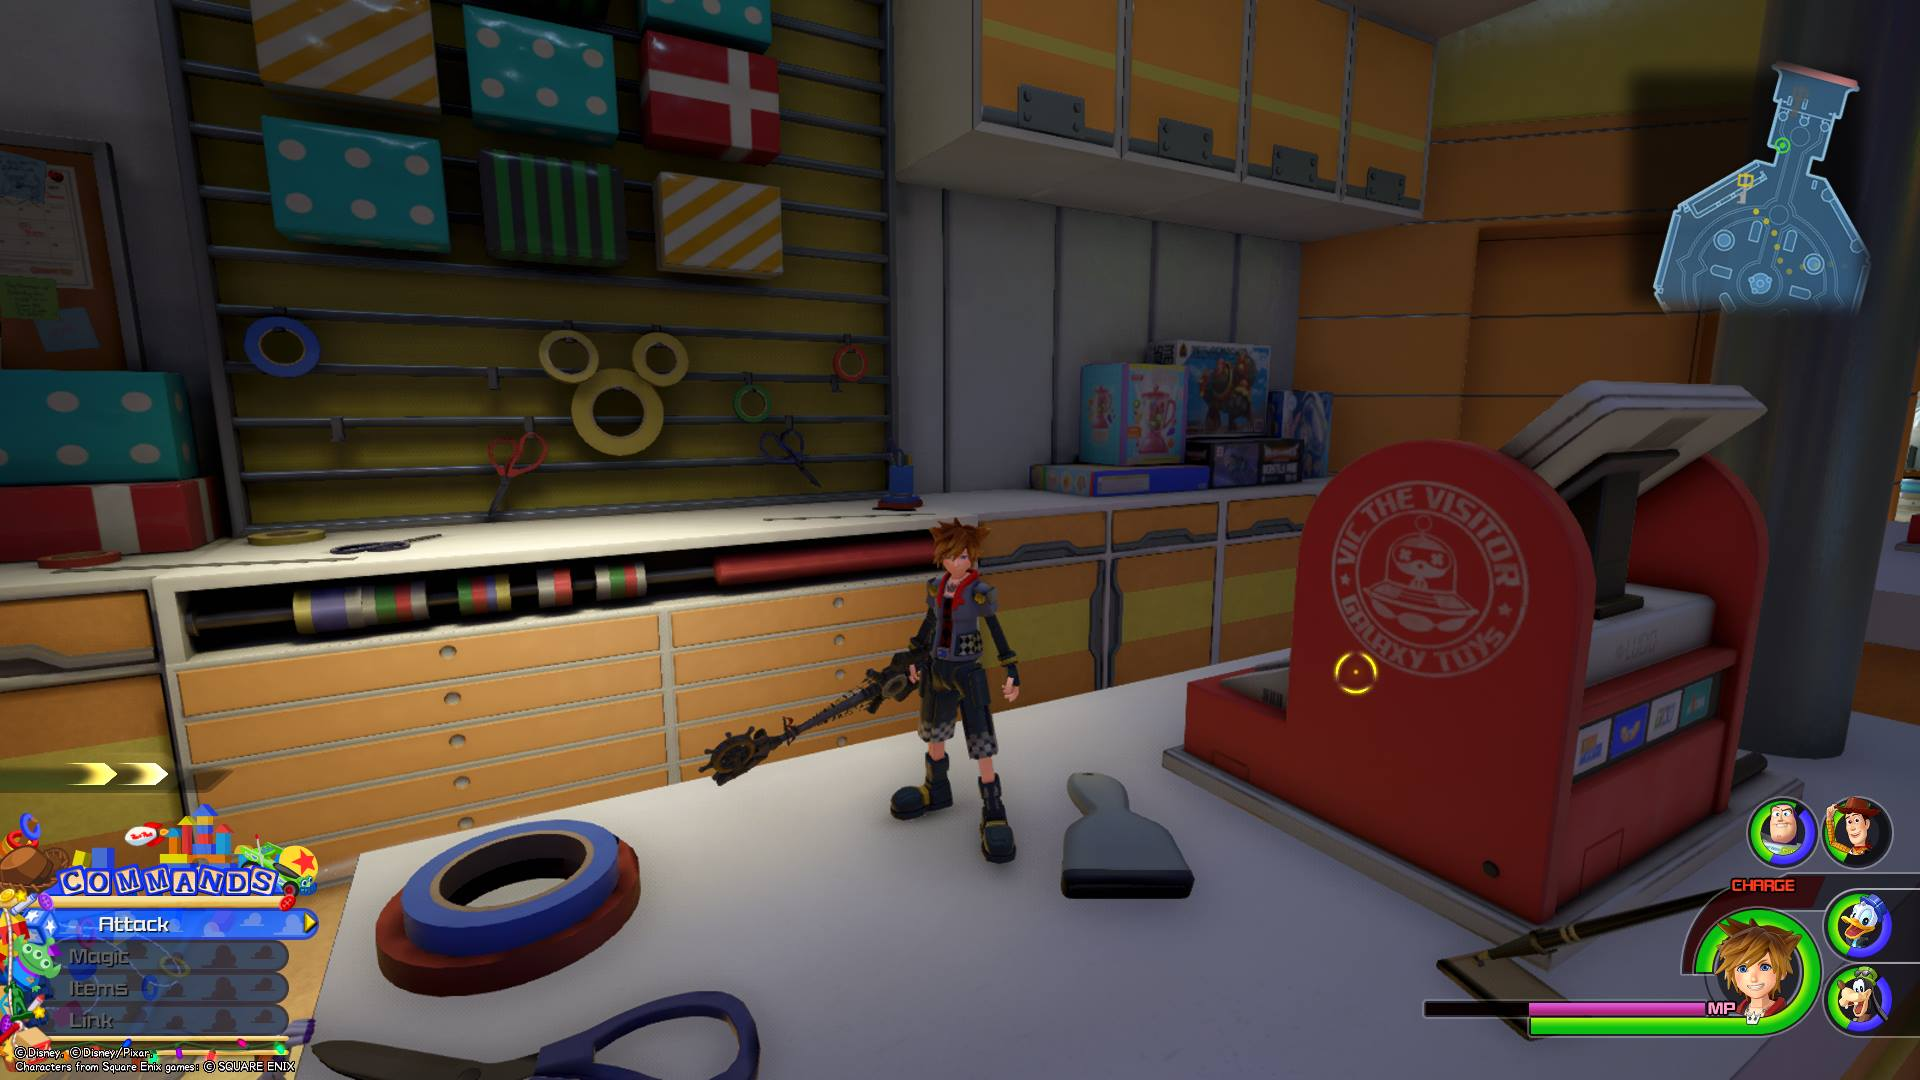 Kingdom Hearts 3 - Toy Box Lucky Emblem 6